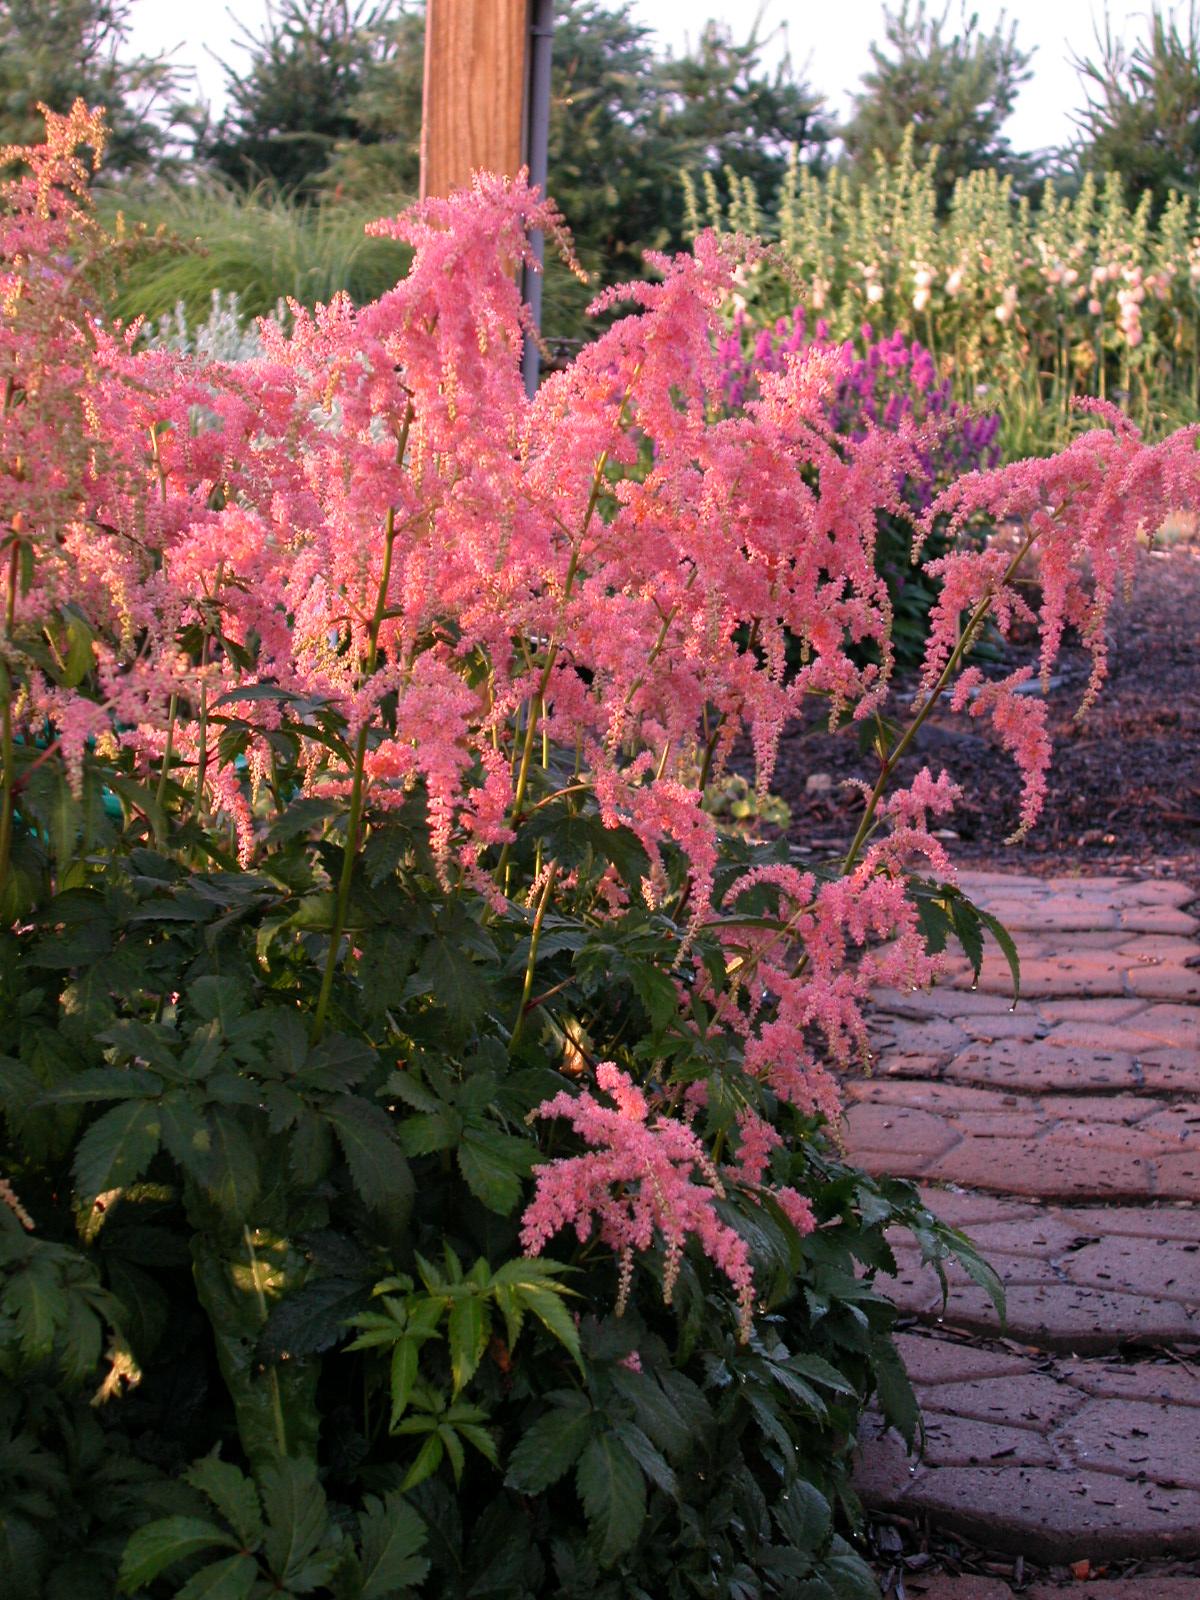 Earthworks St Peter Minnesota Perennials Vs Annuals